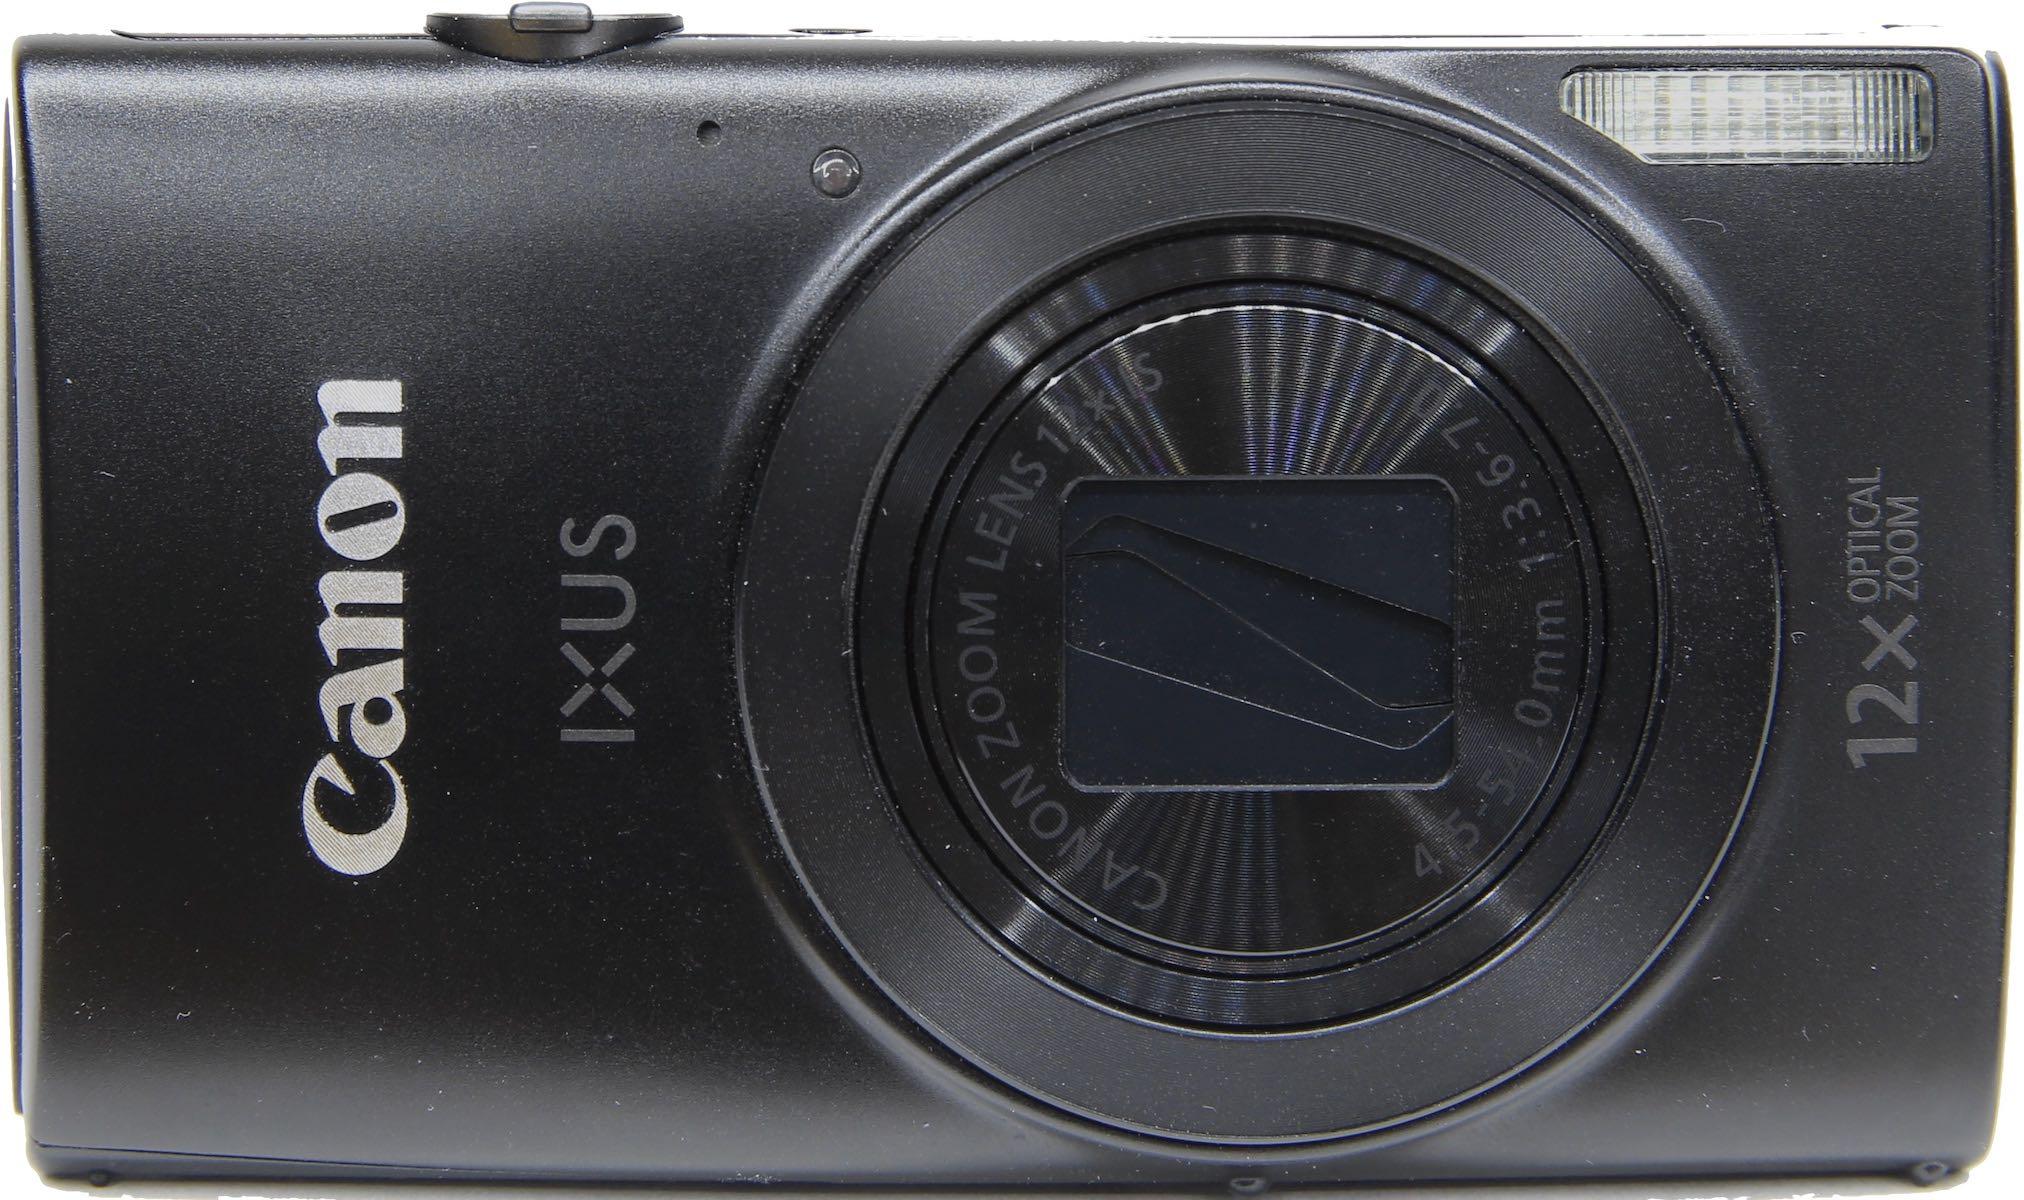 Ixus 170